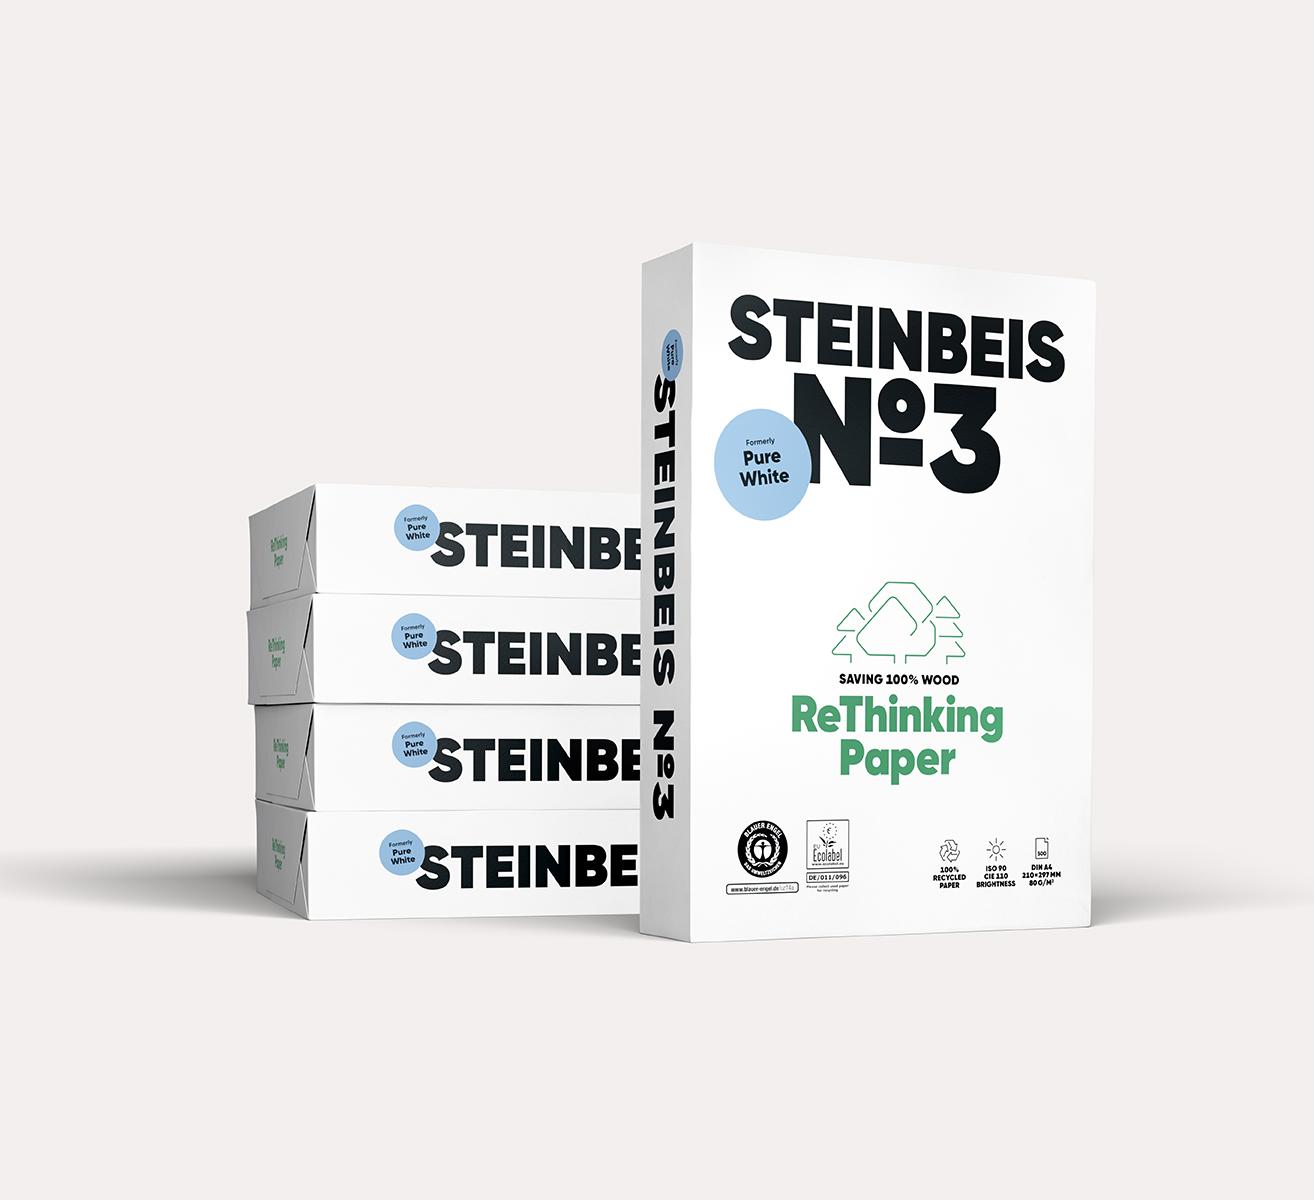 Steinbeis №3